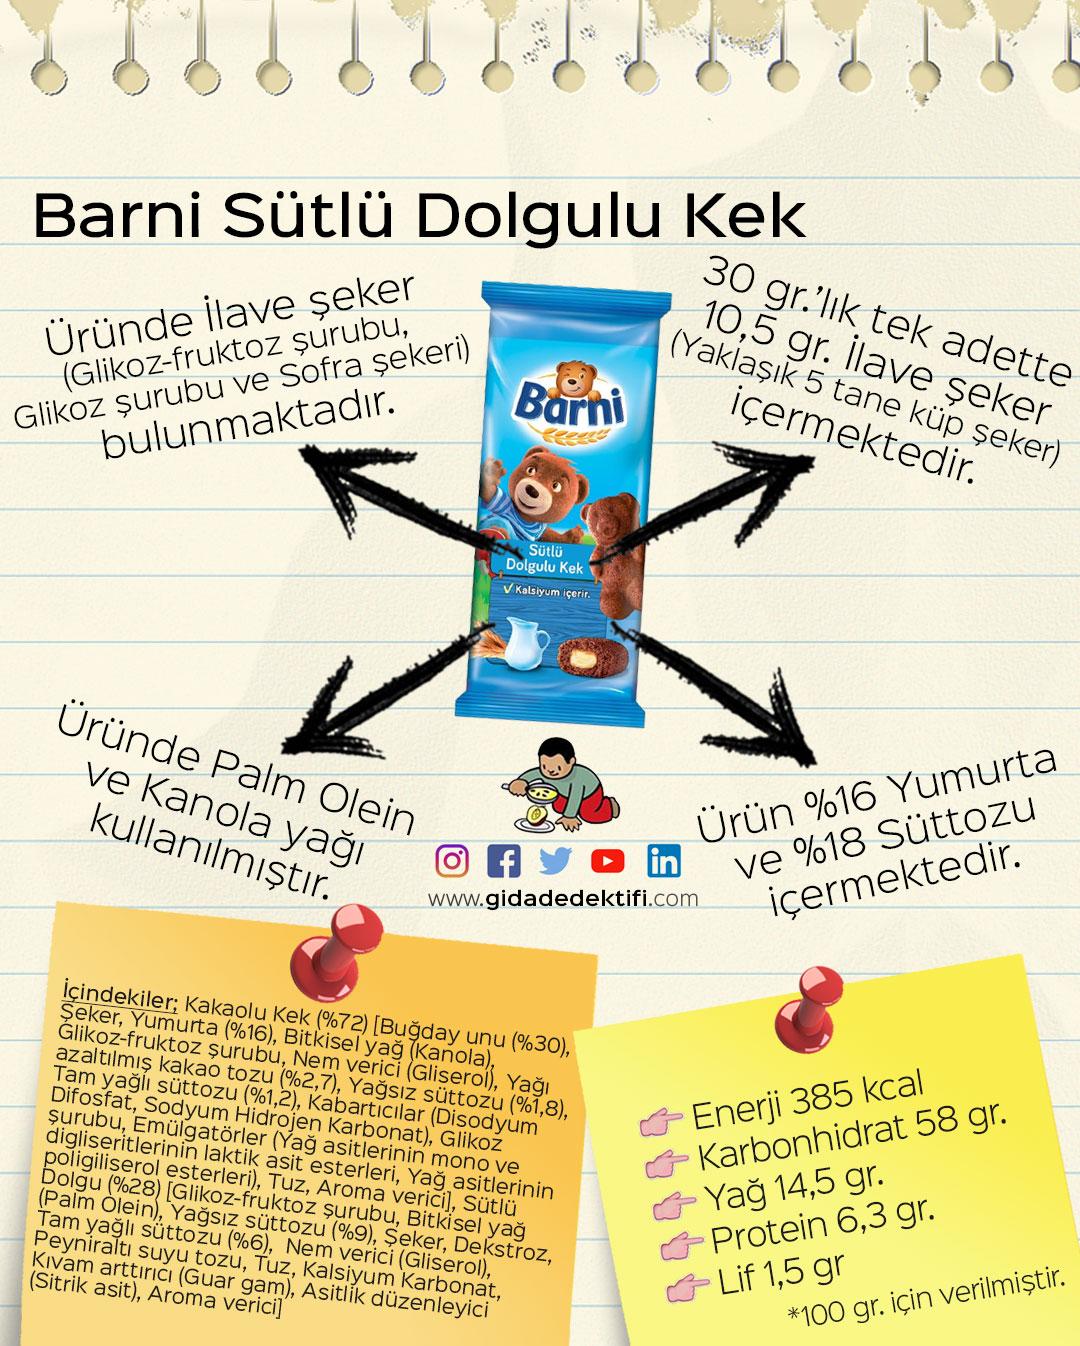 Barni-Kek-Sütlü-Dolgulu